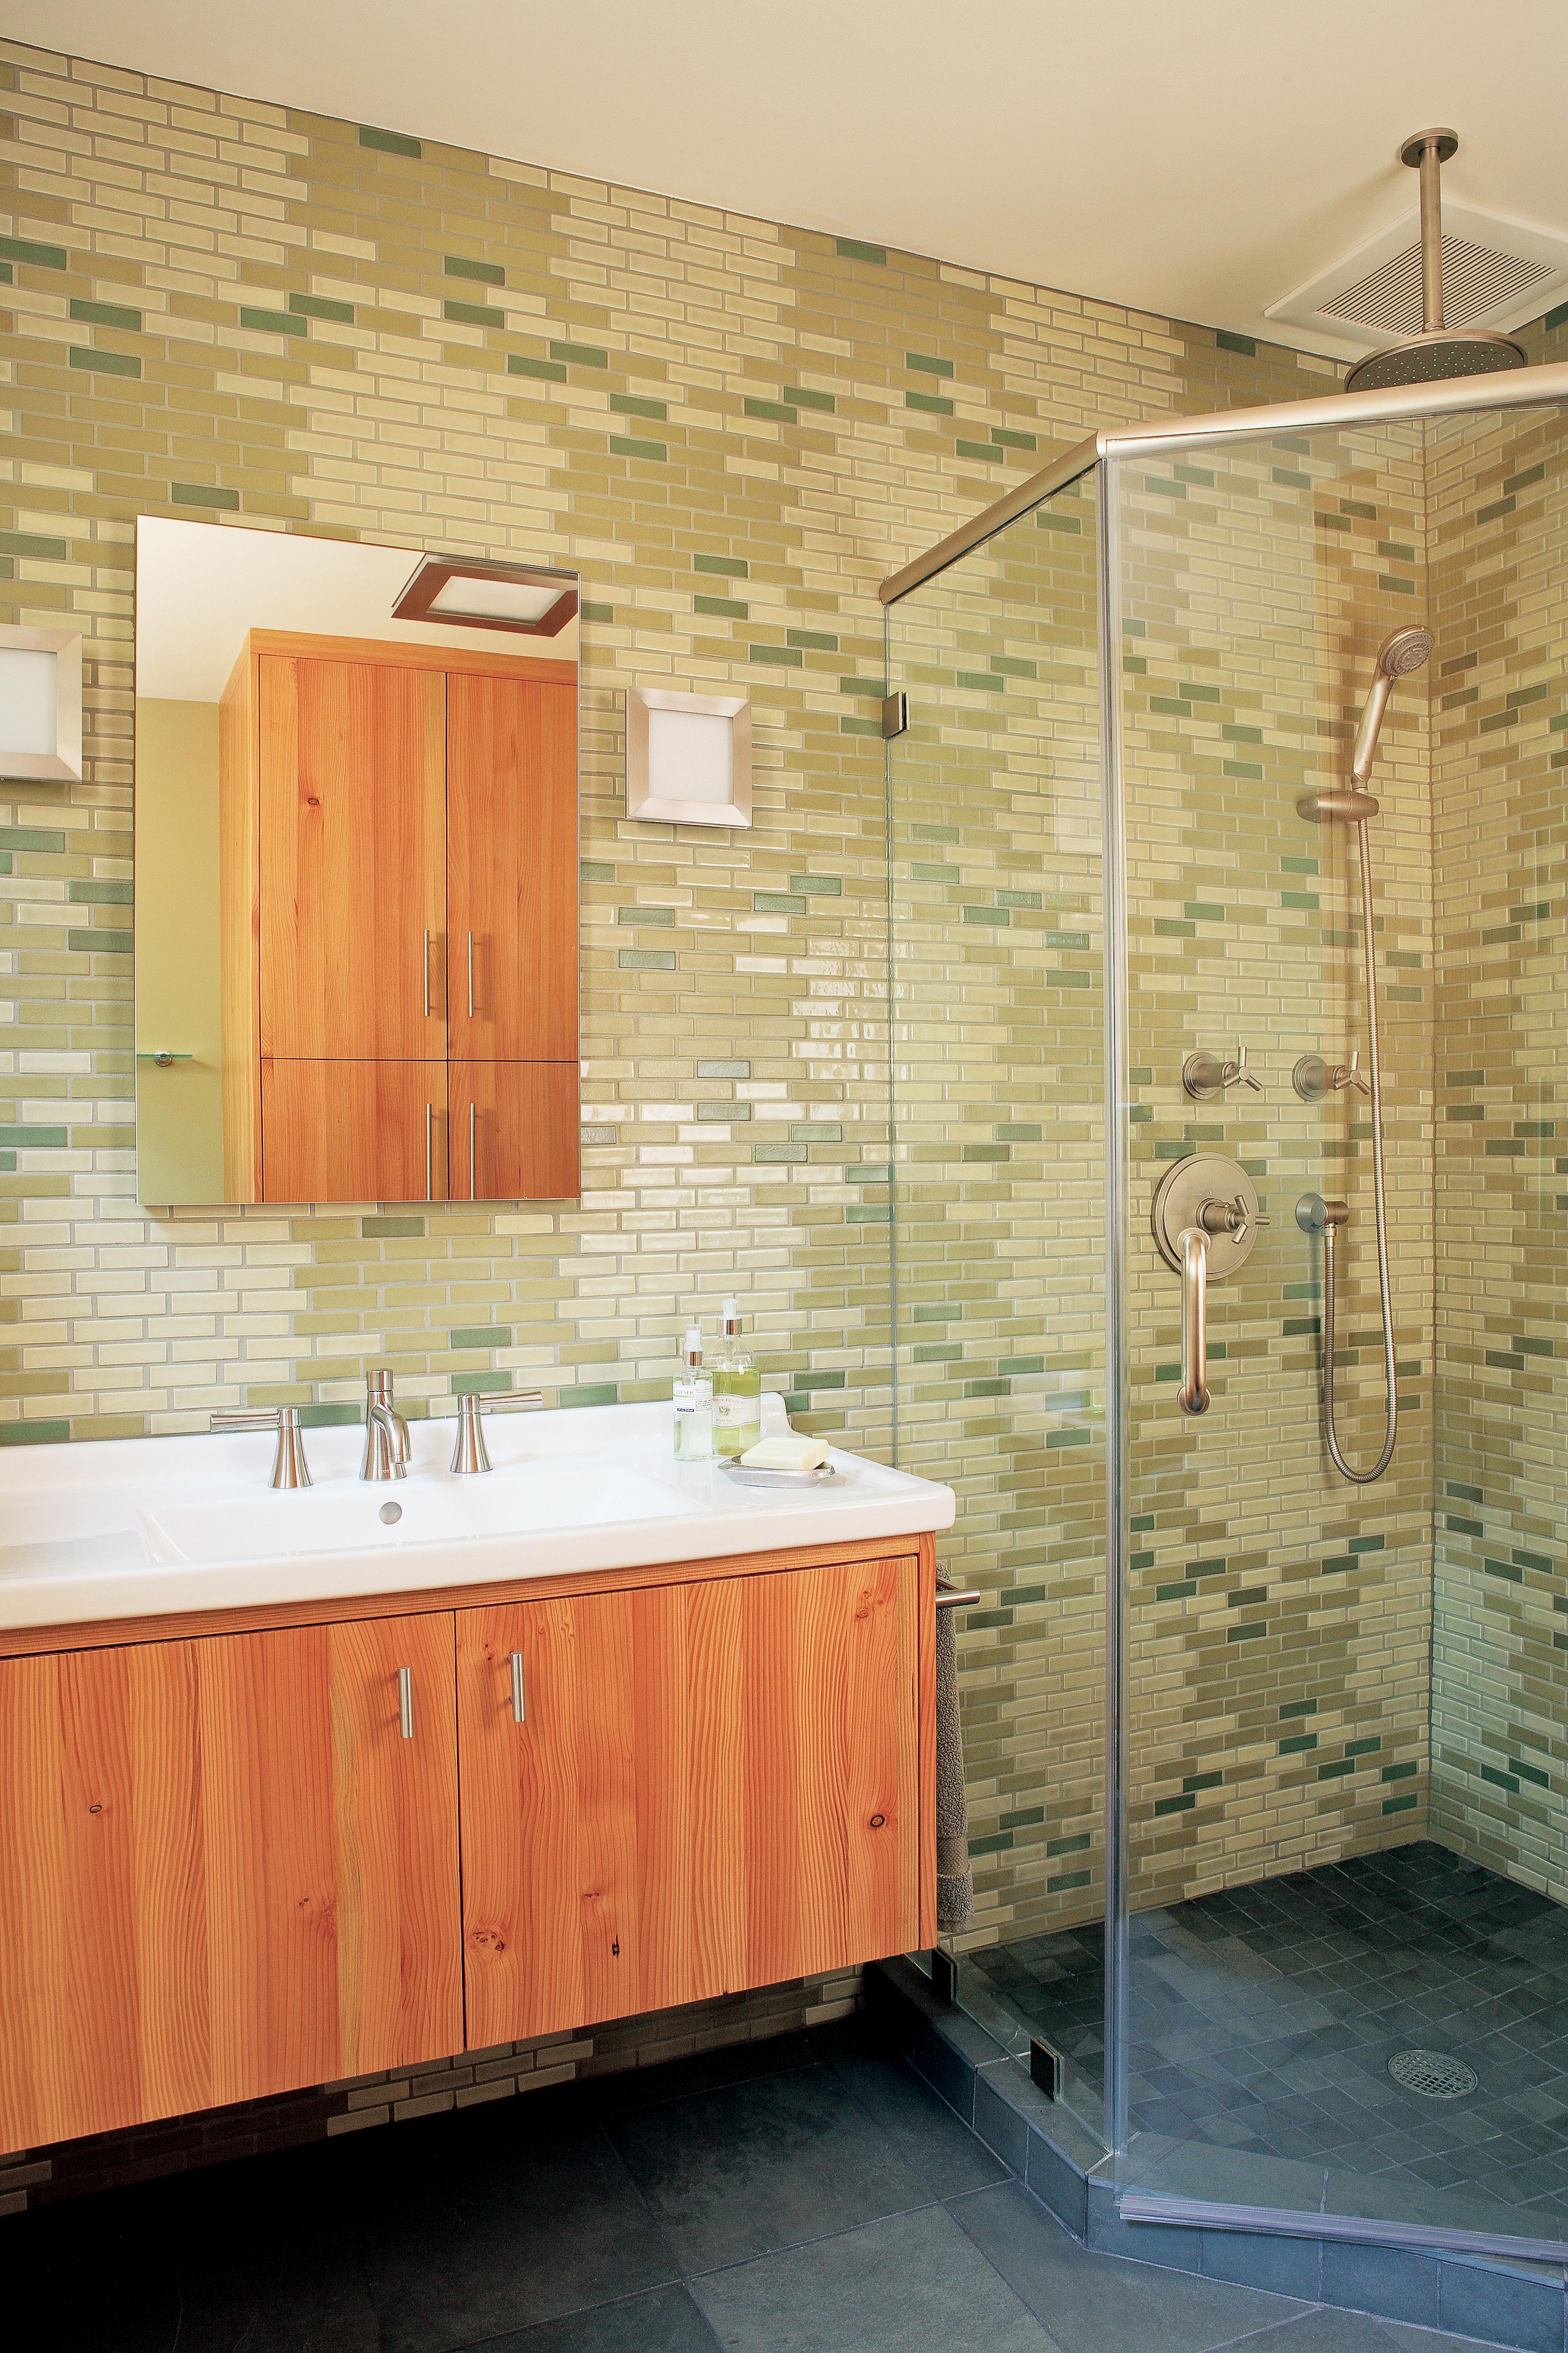 12 Ideas for Bathroom Counters - Sunset Magazine